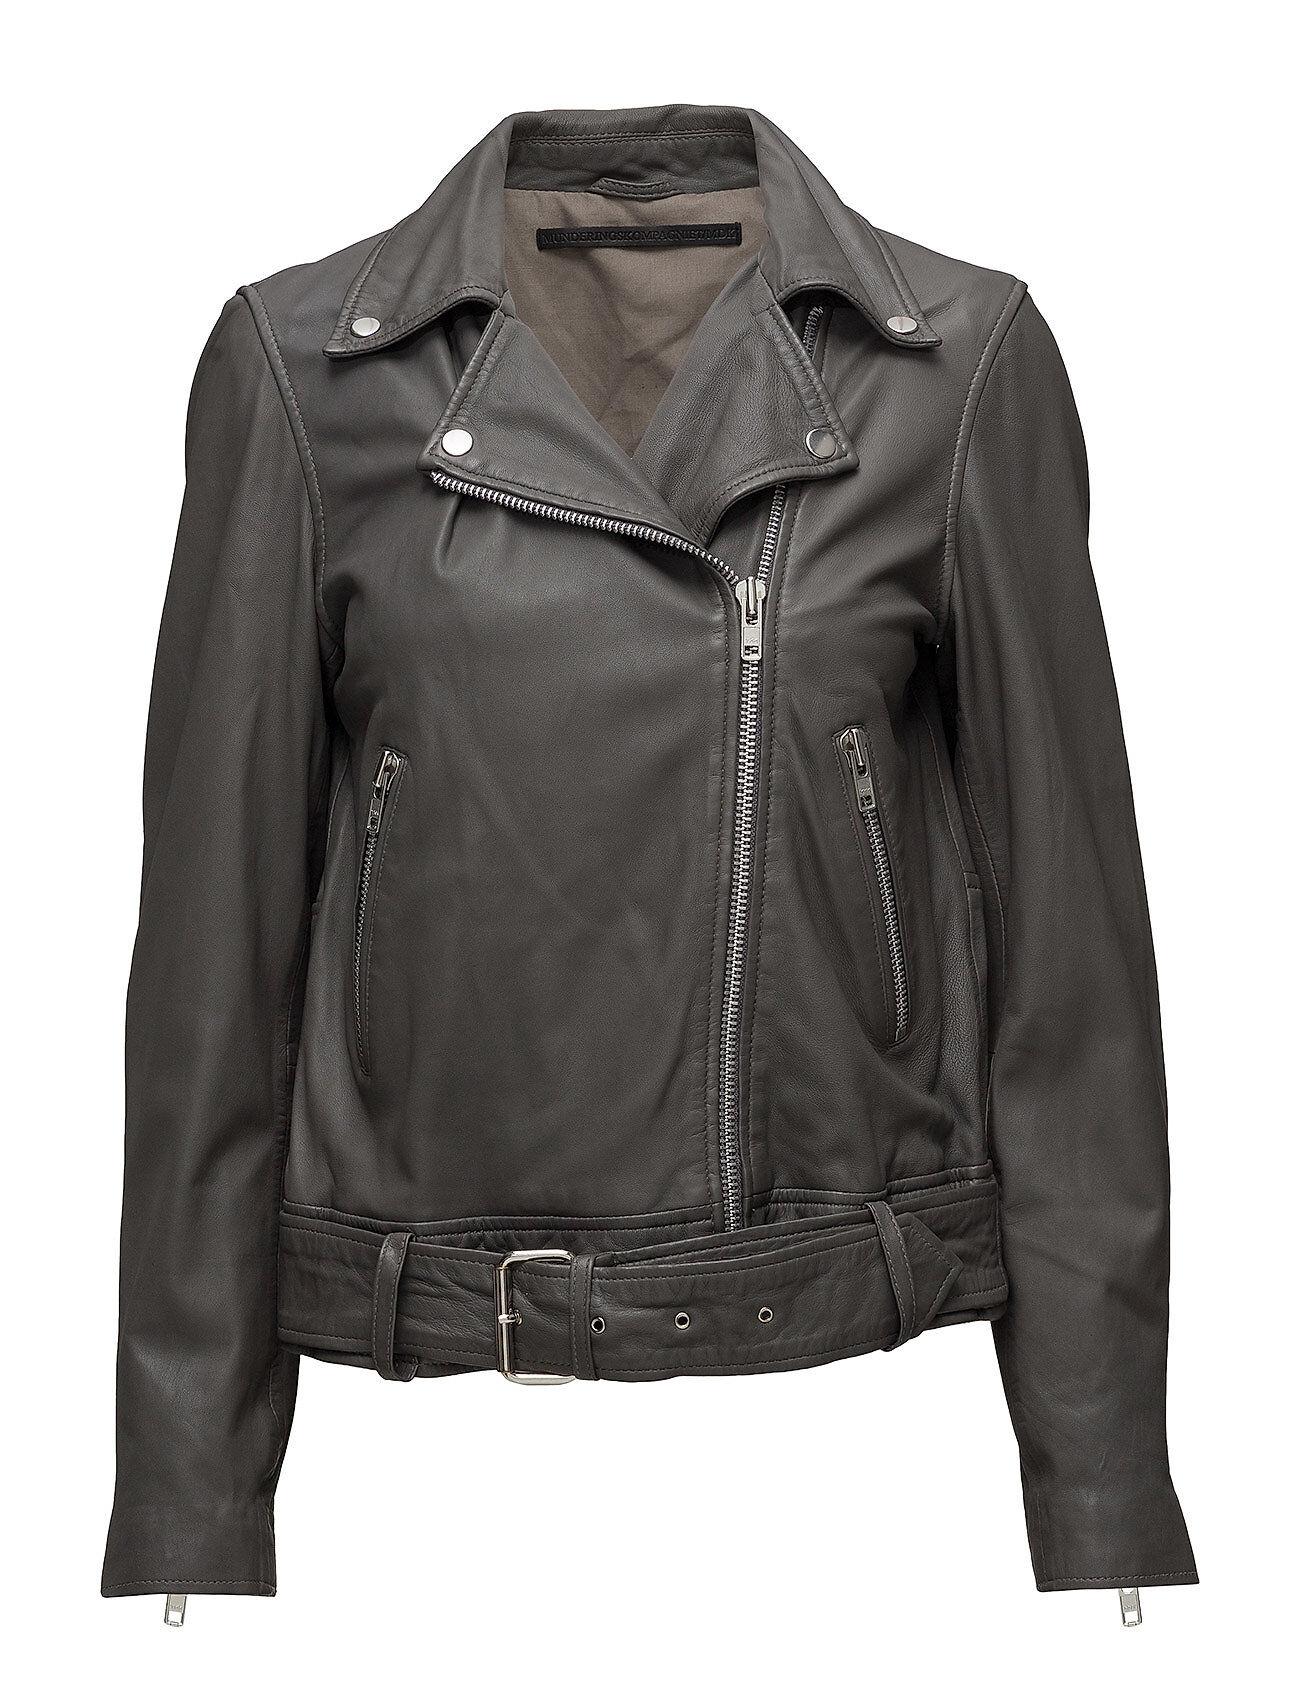 MDK / Munderingskompagniet Liva Oversized Biker Jacket